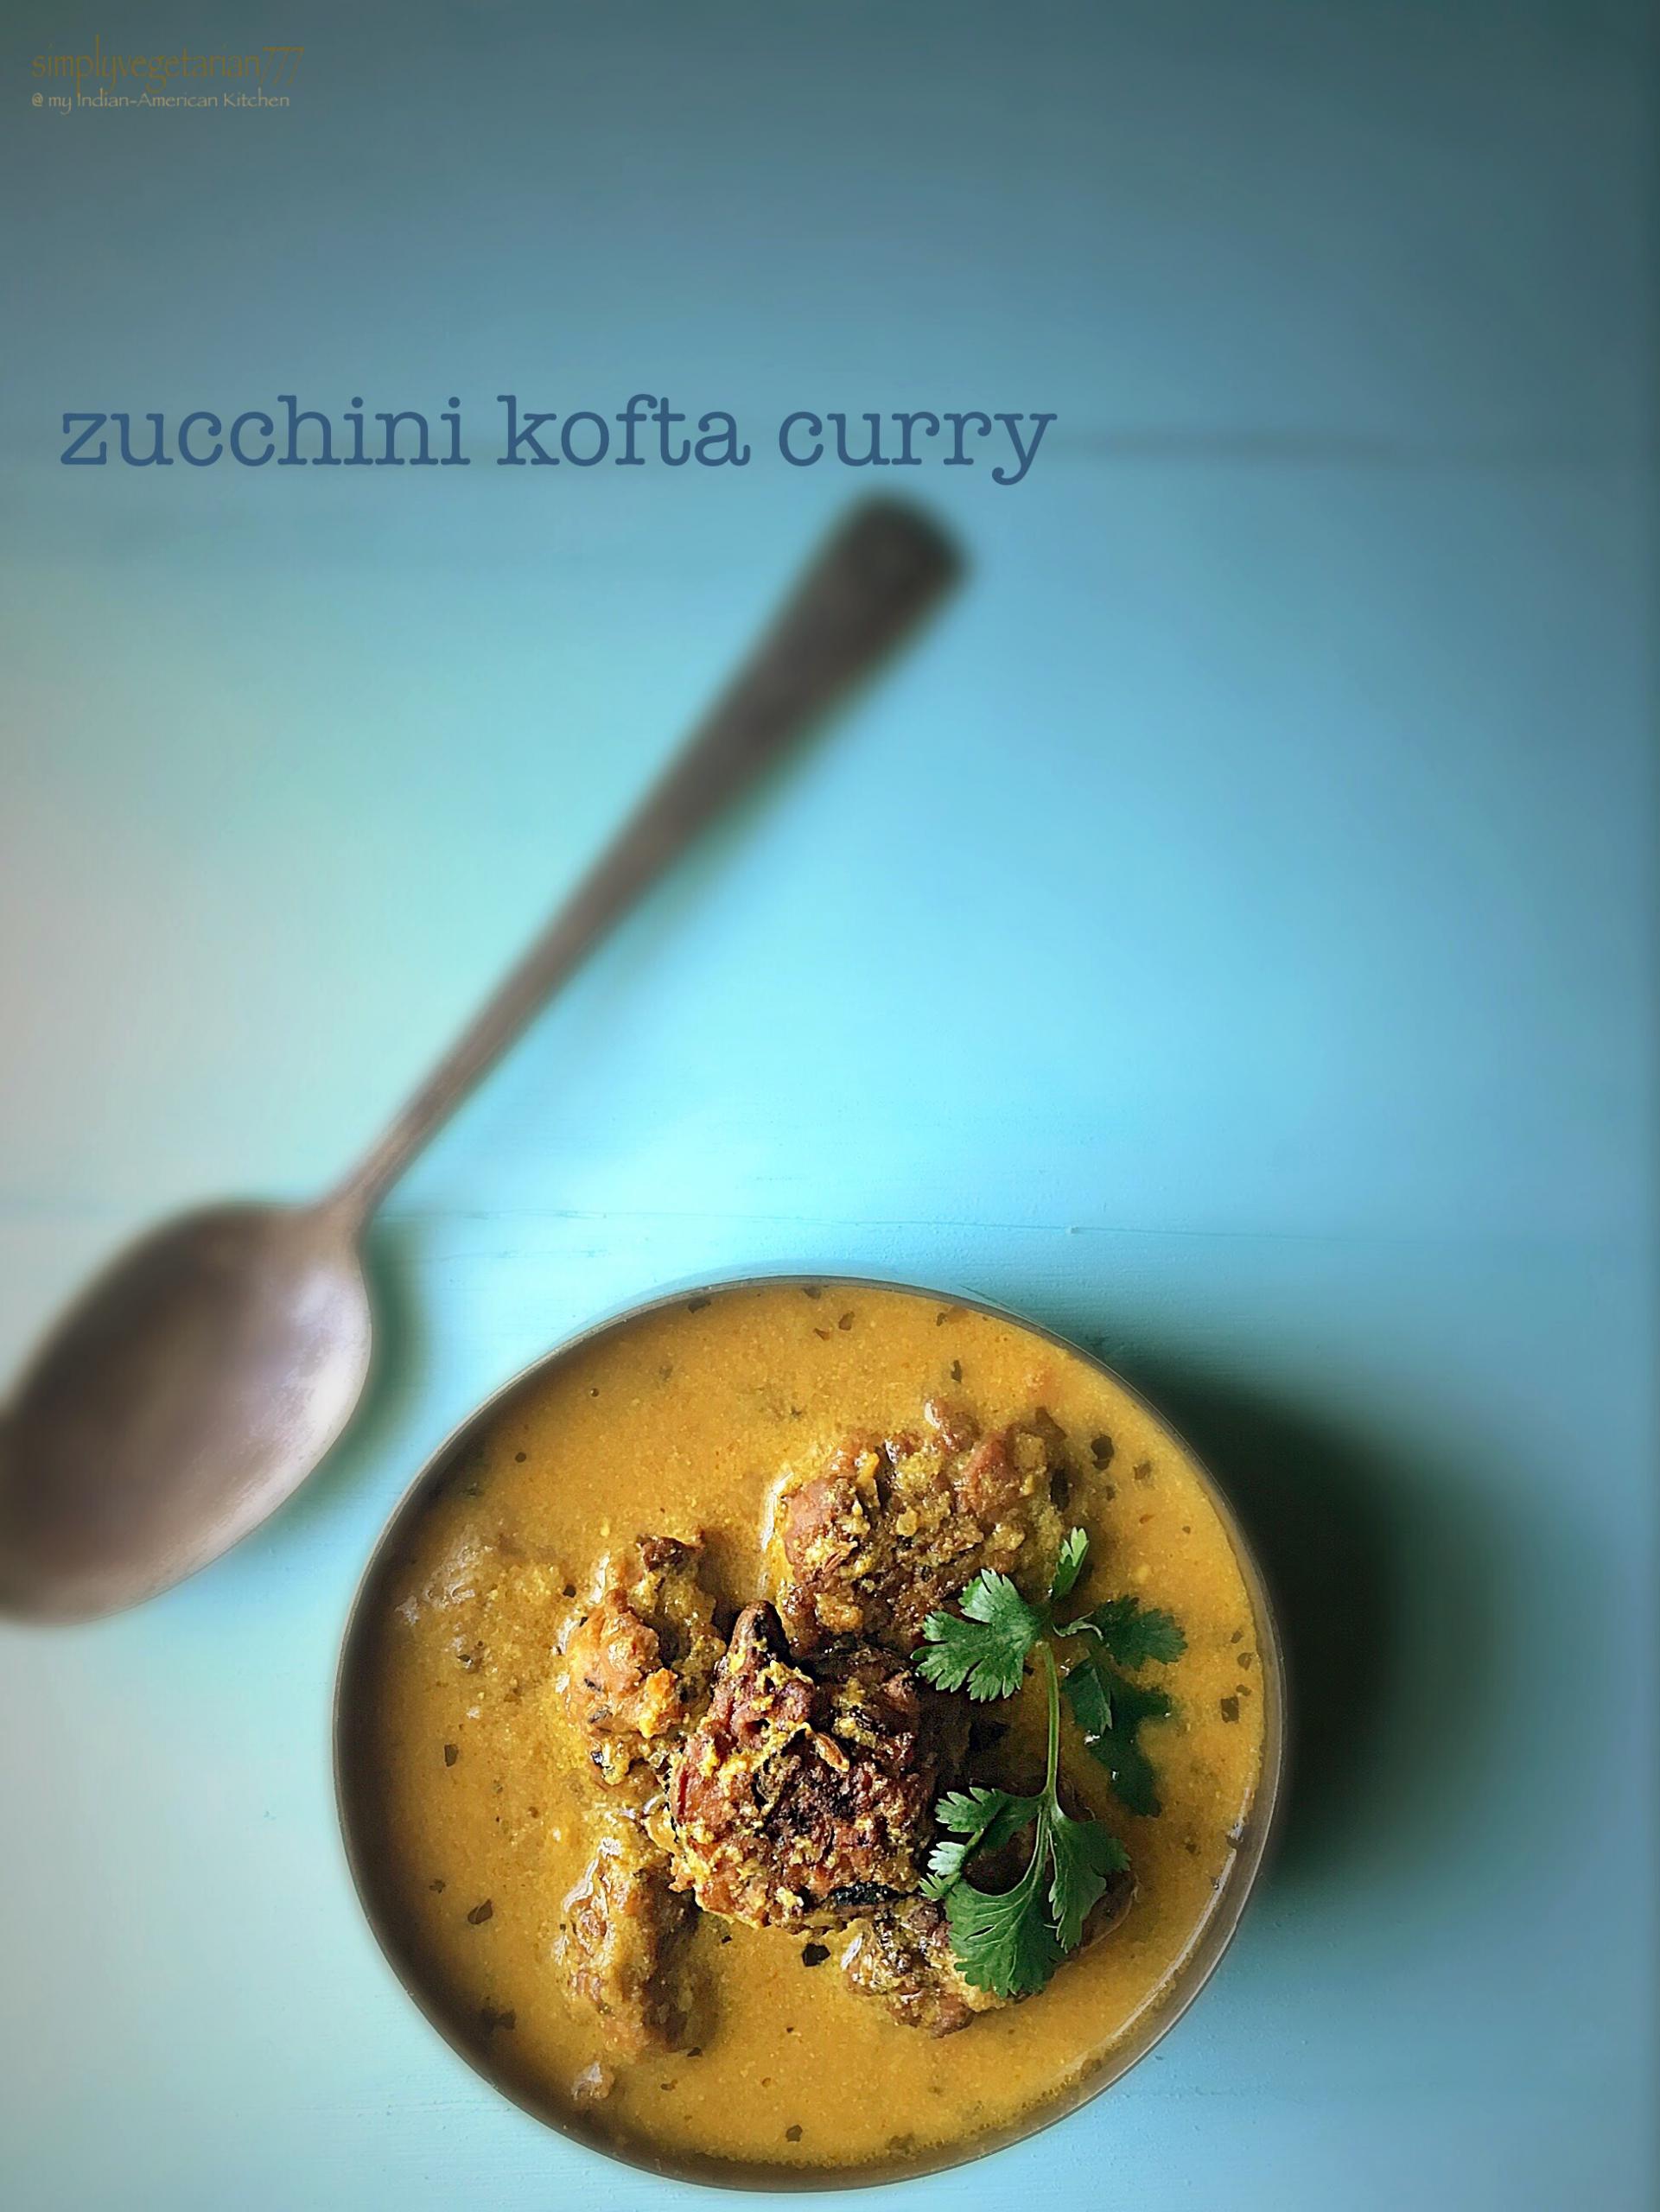 Zucchini Kofta Curry